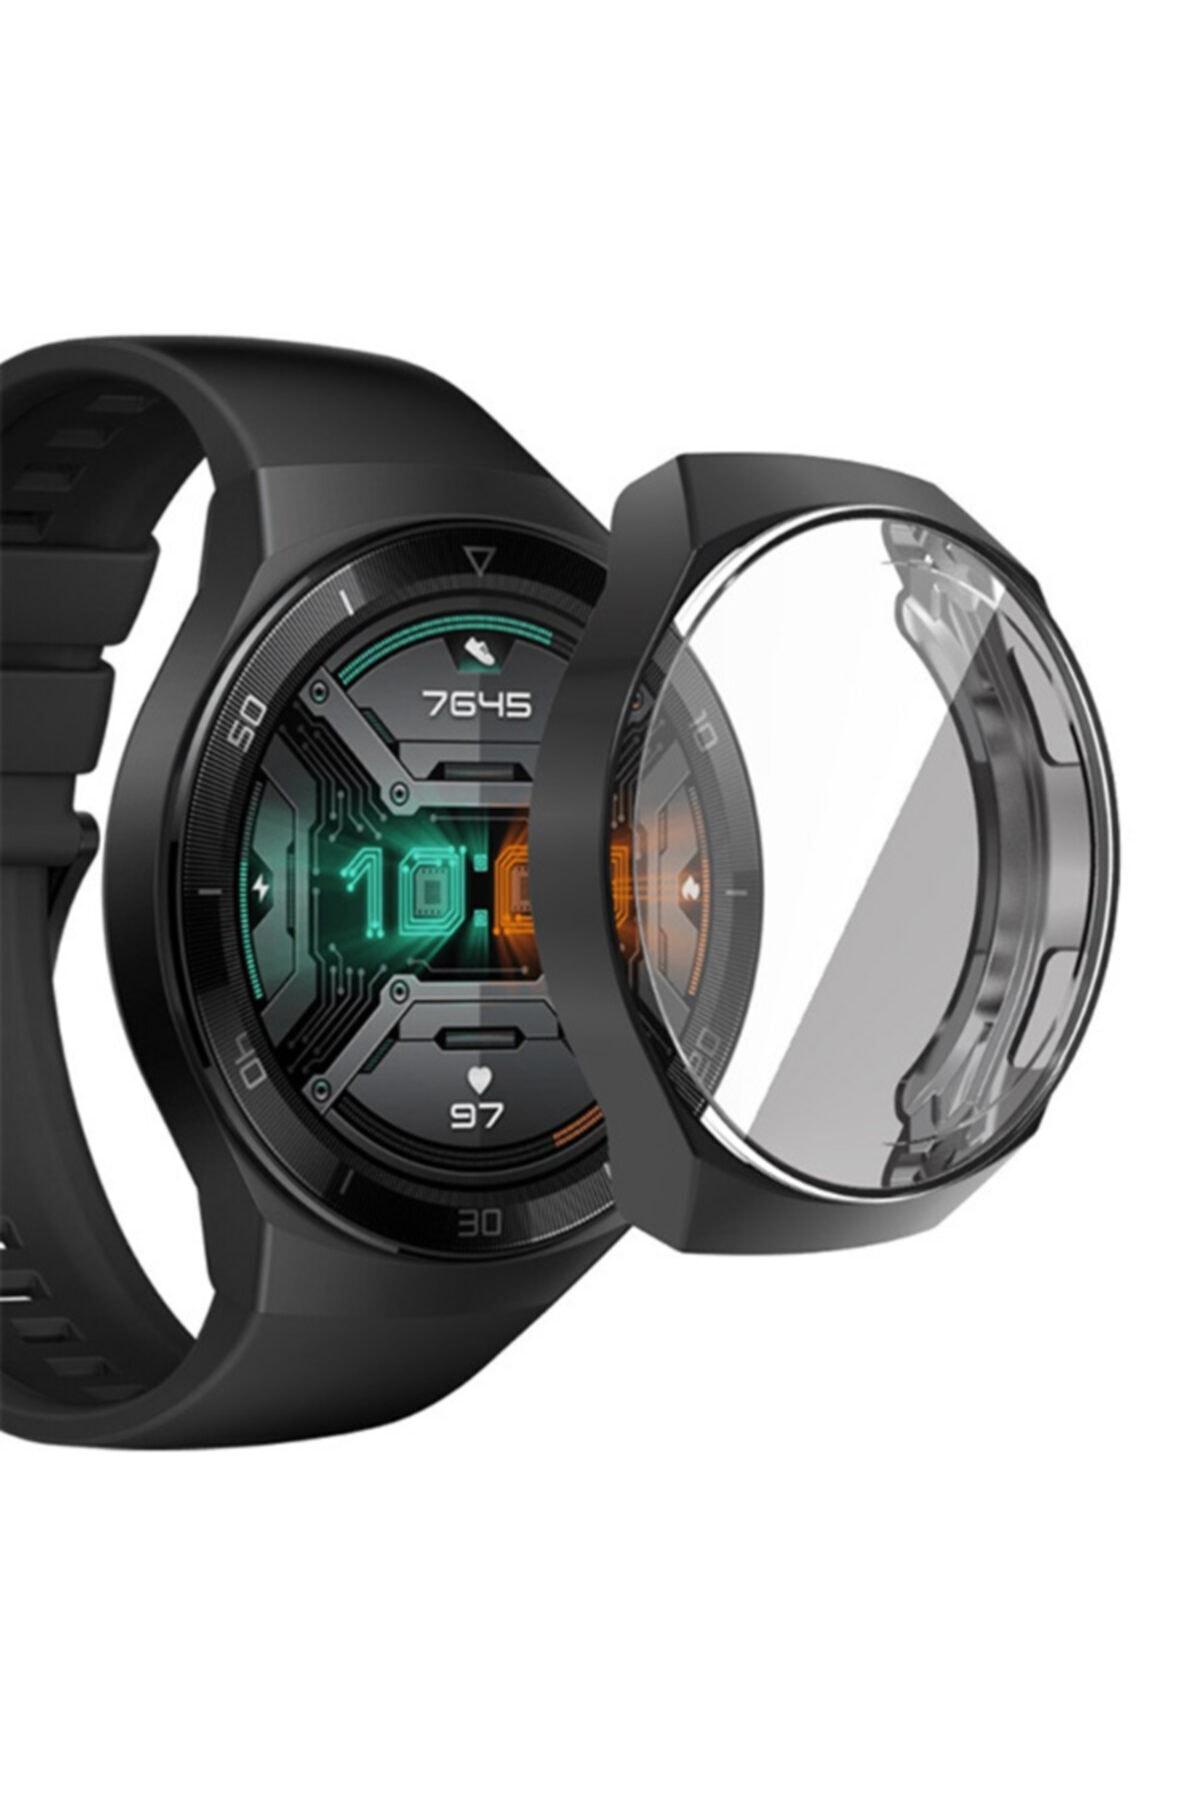 MORTY Huawei Watch Gt 2e Uyumlu 360 Koruma Silikon Kılıf 46mm 1